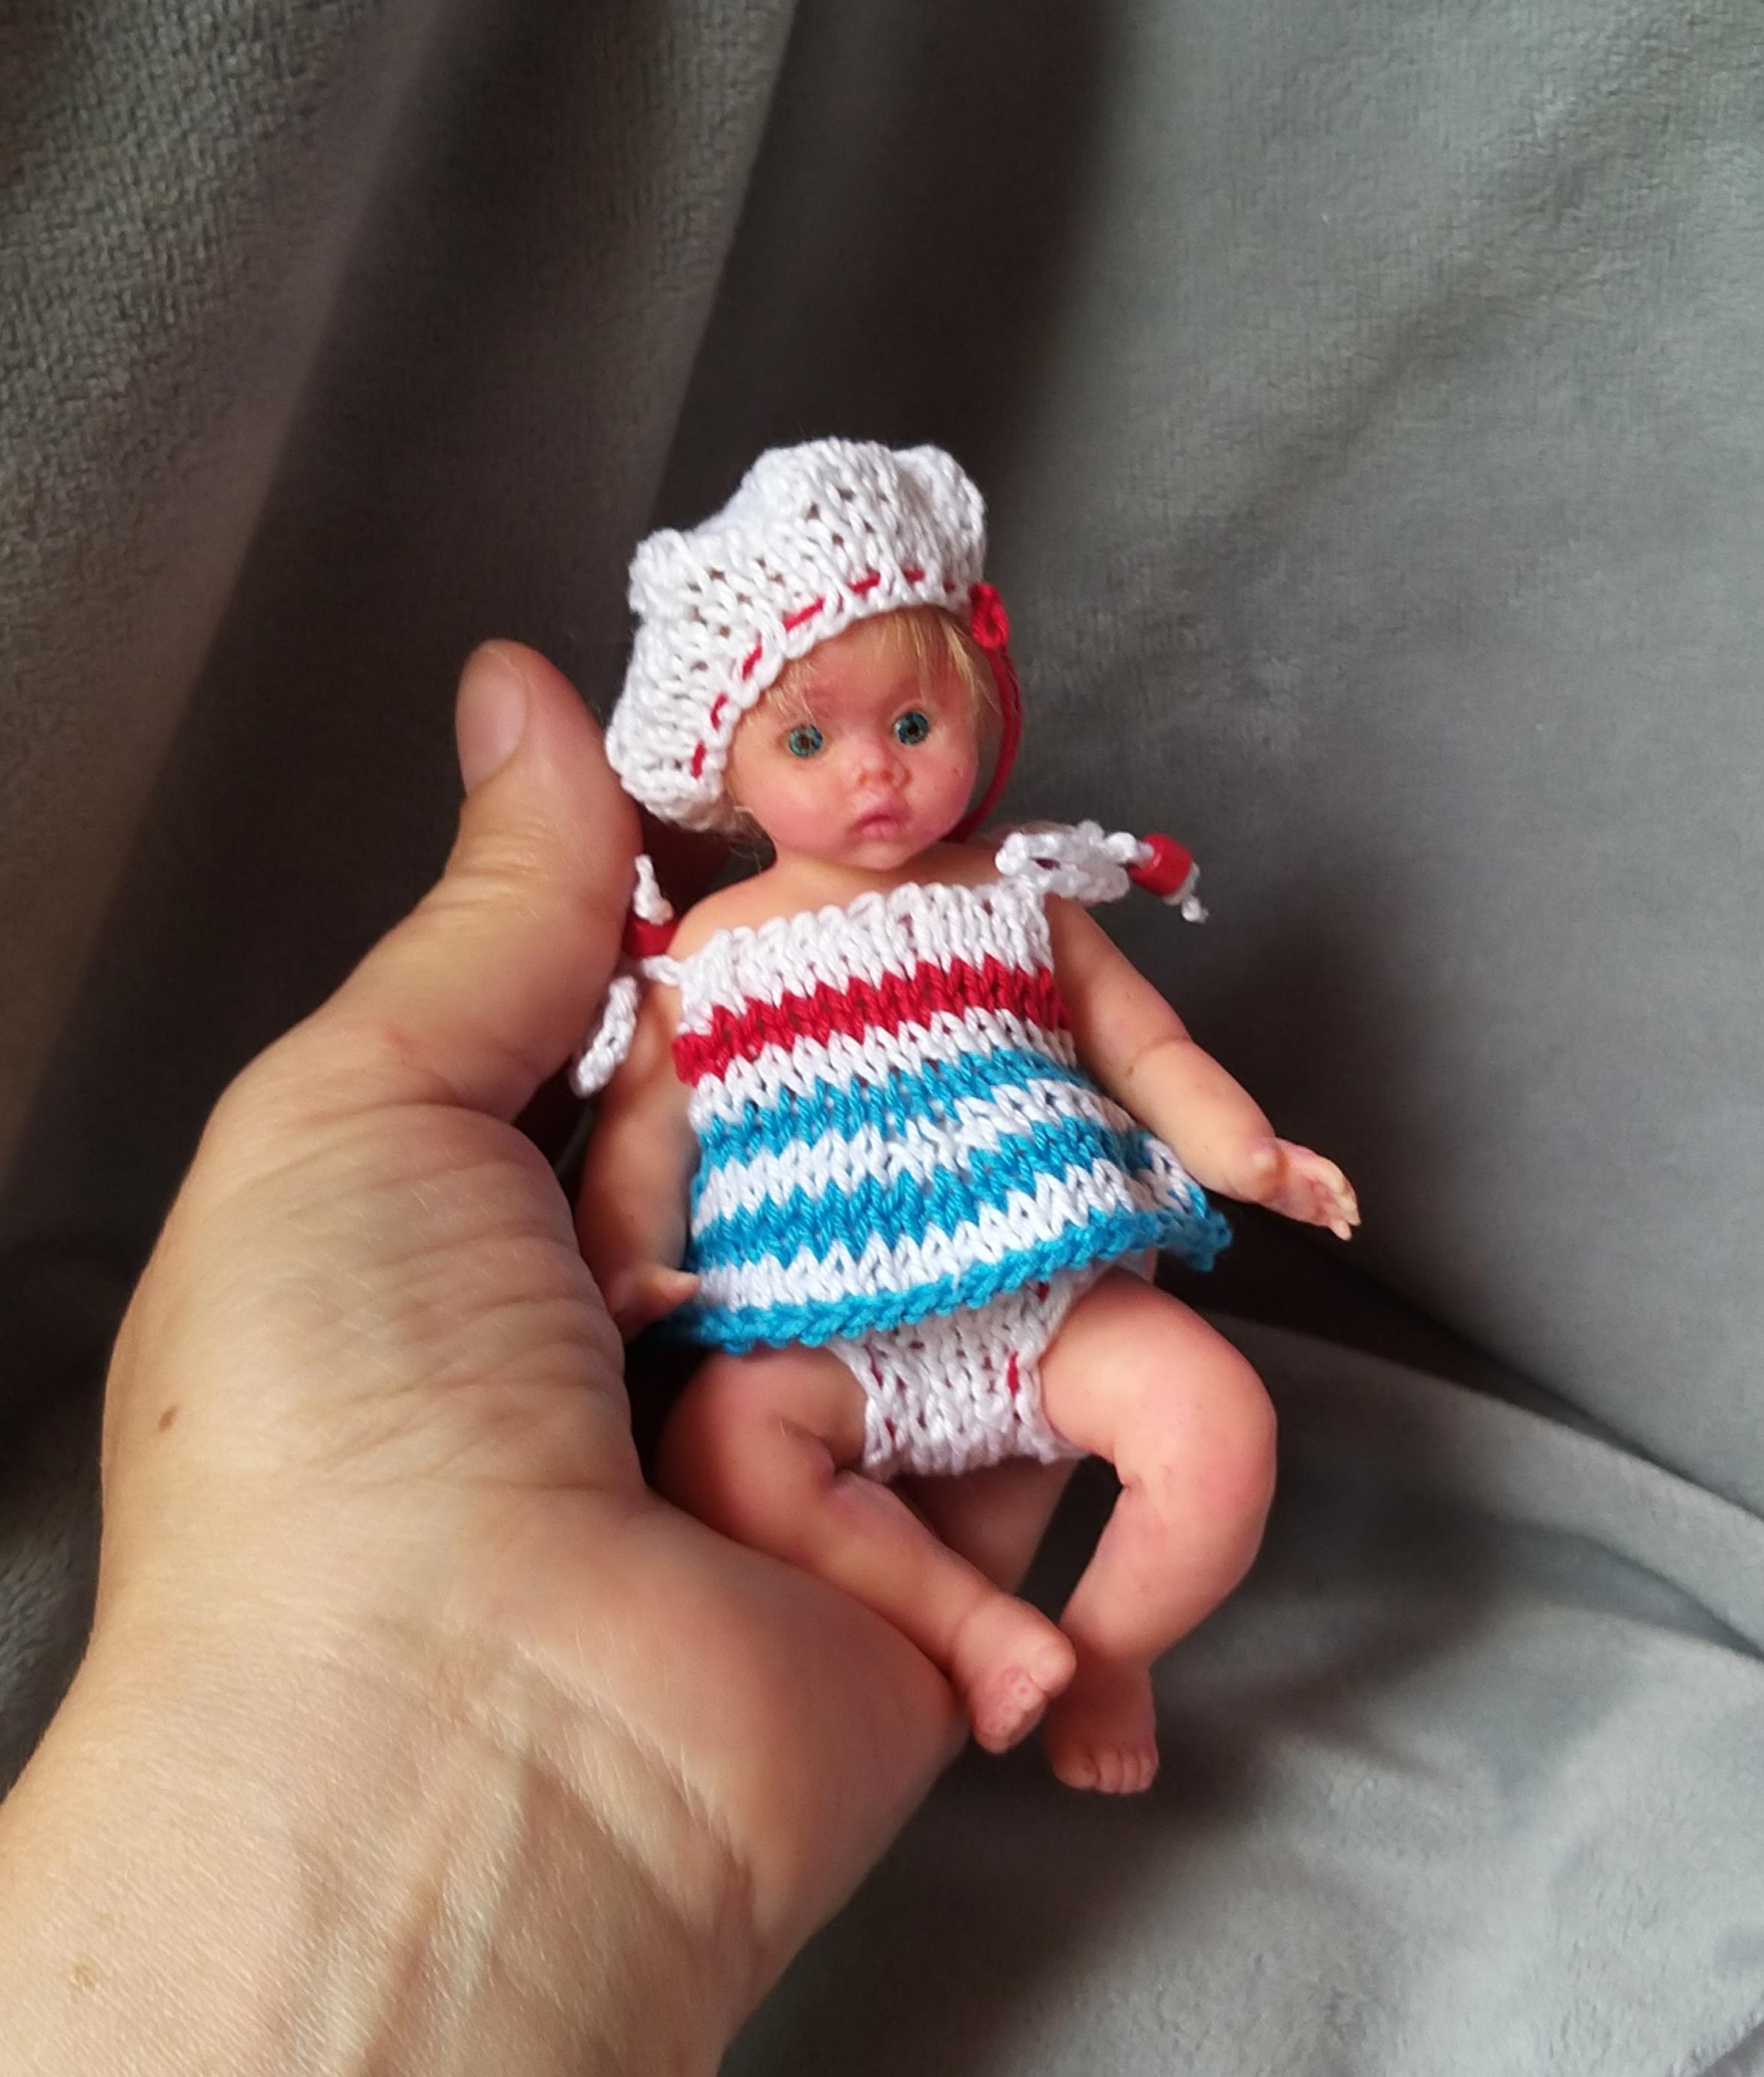 silicone baby doll mini full body Kovalevadoll712